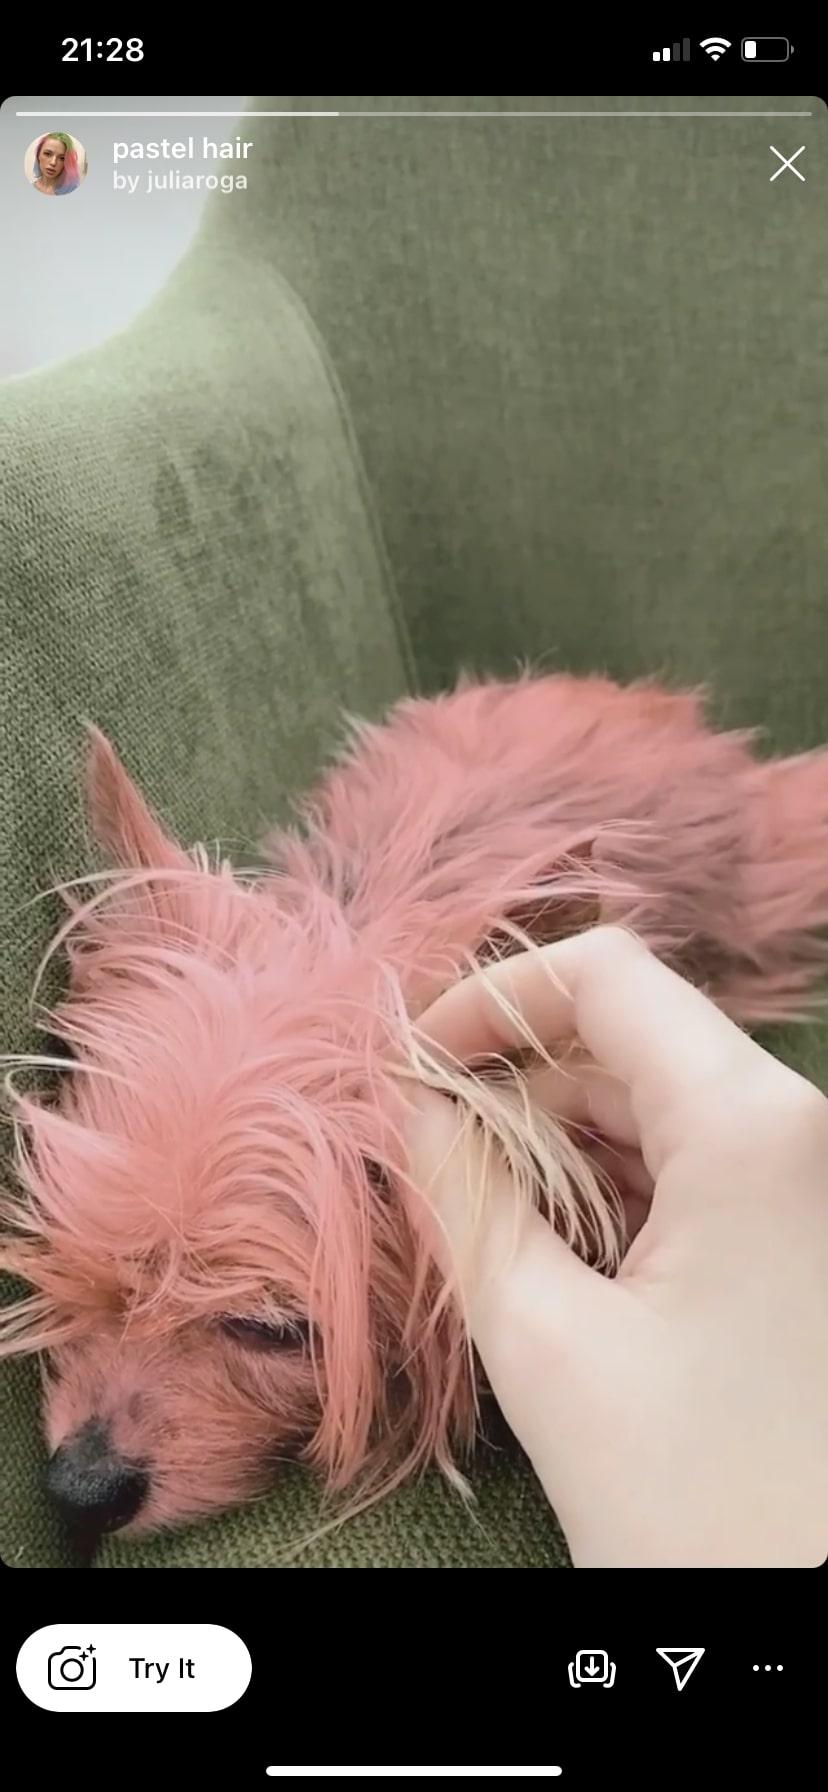 pastel hair by @juliaroga Instagram filter